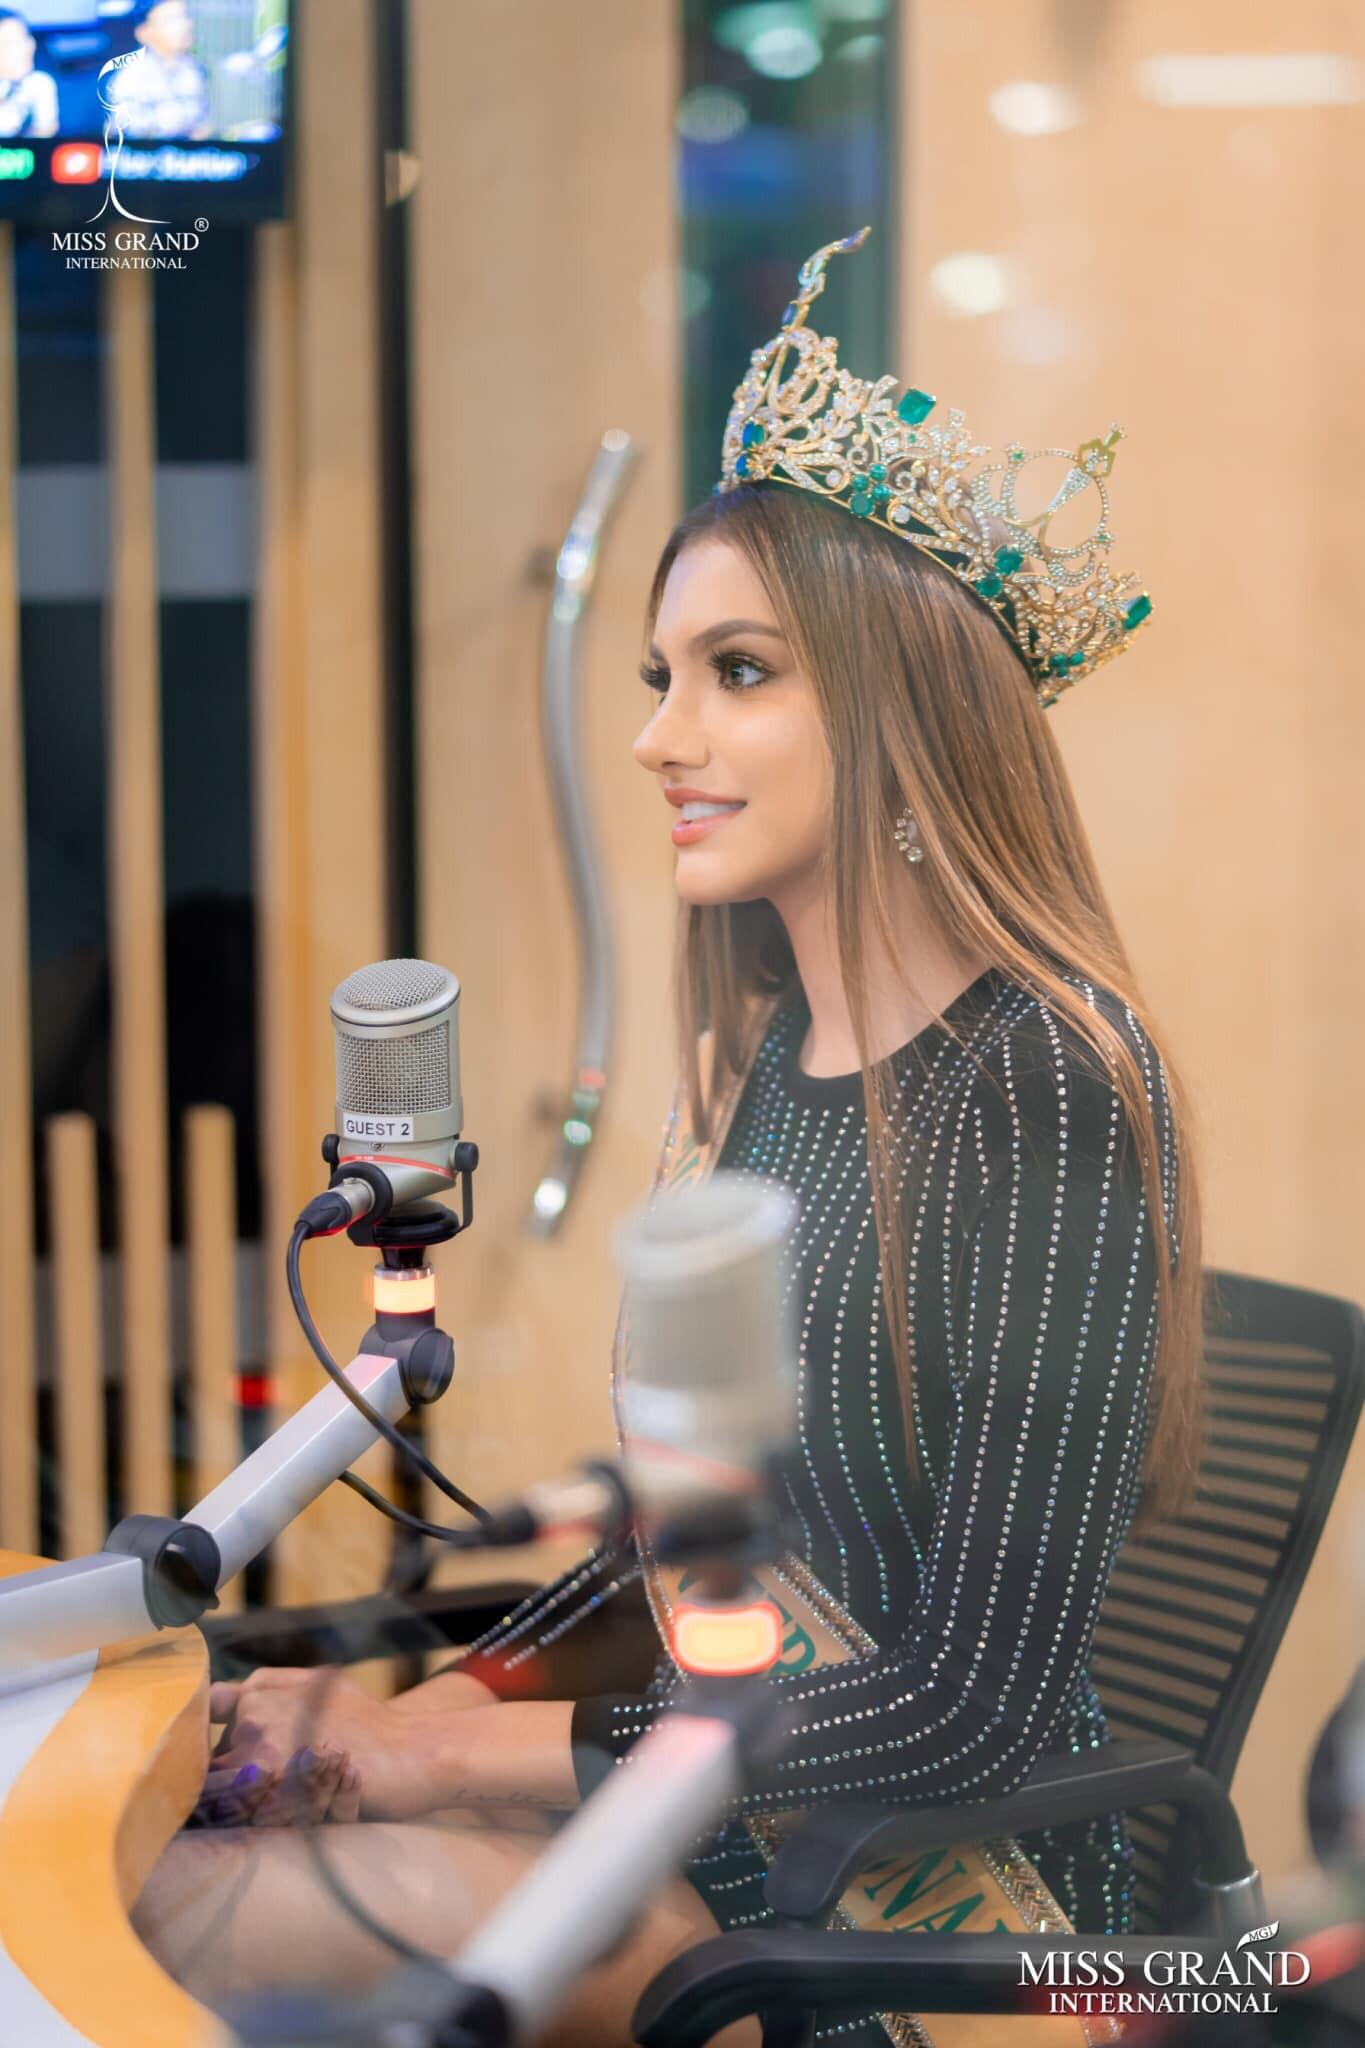 lourdes valentina figuera, miss grand international 2019. - Página 22 Fevdkq10